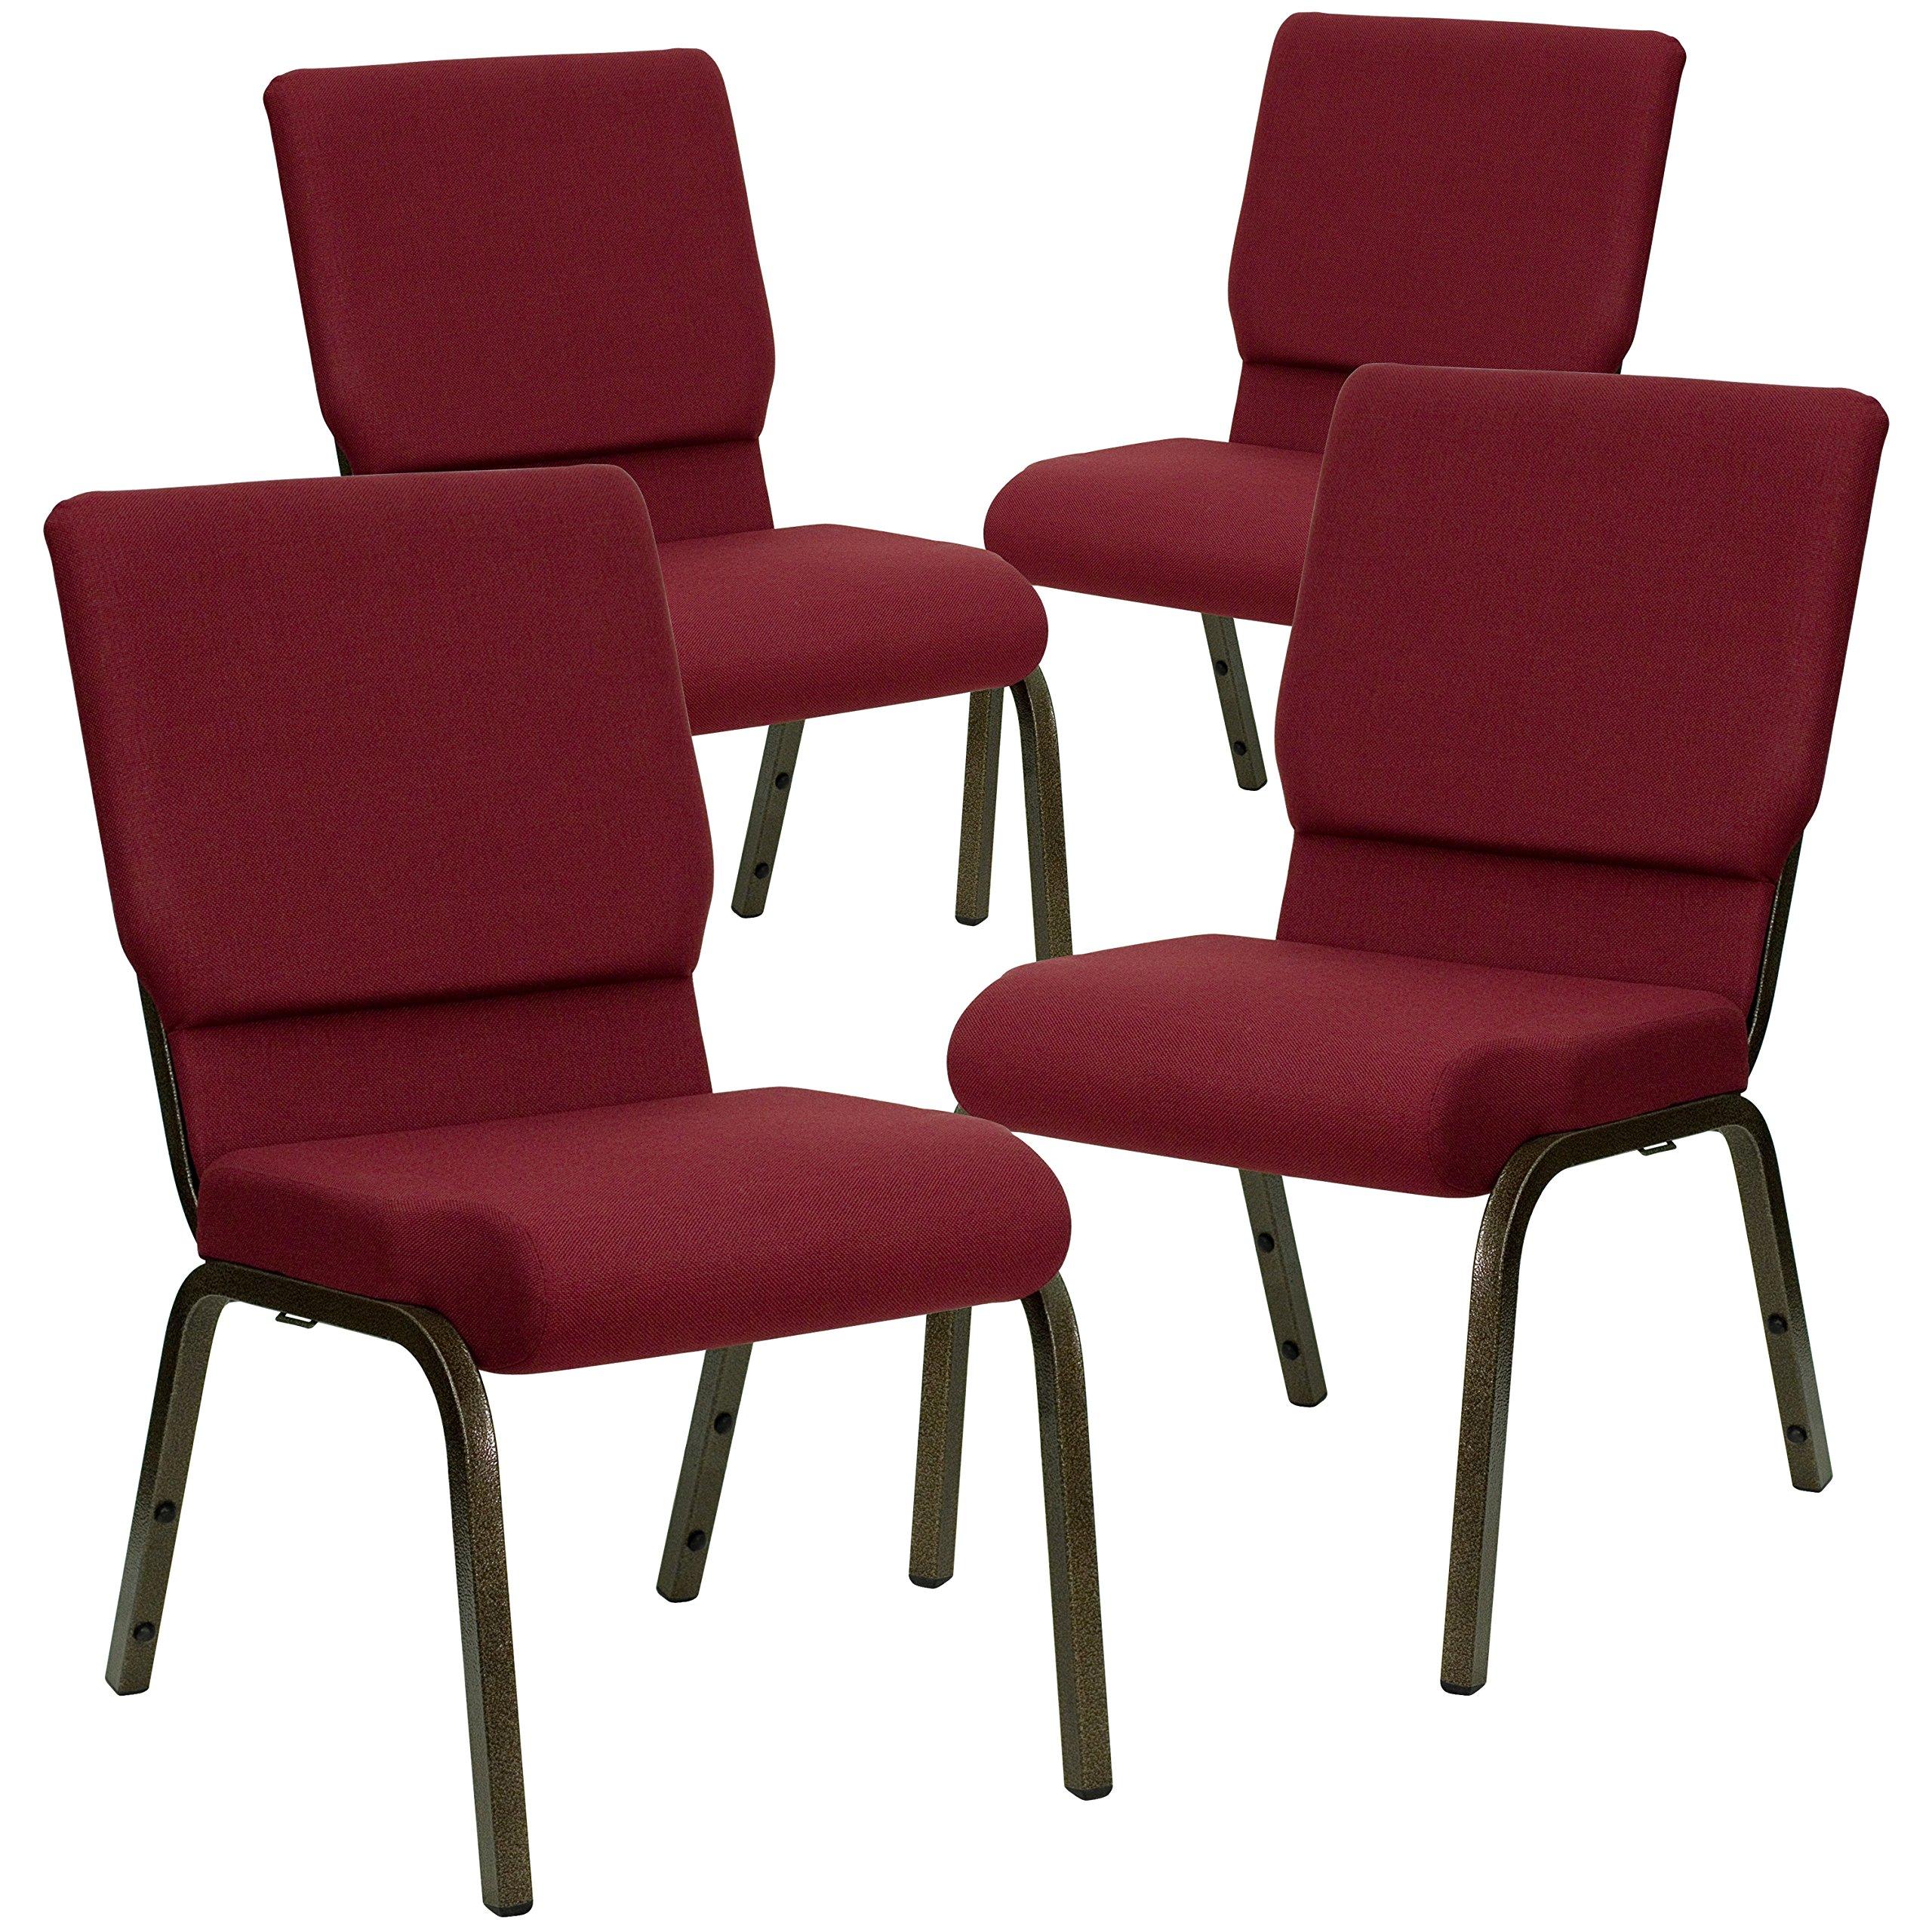 Flash Furniture 4 Pk. HERCULES Series 18.5''W Stacking Church Chair in Burgundy Fabric - Gold Vein Frame